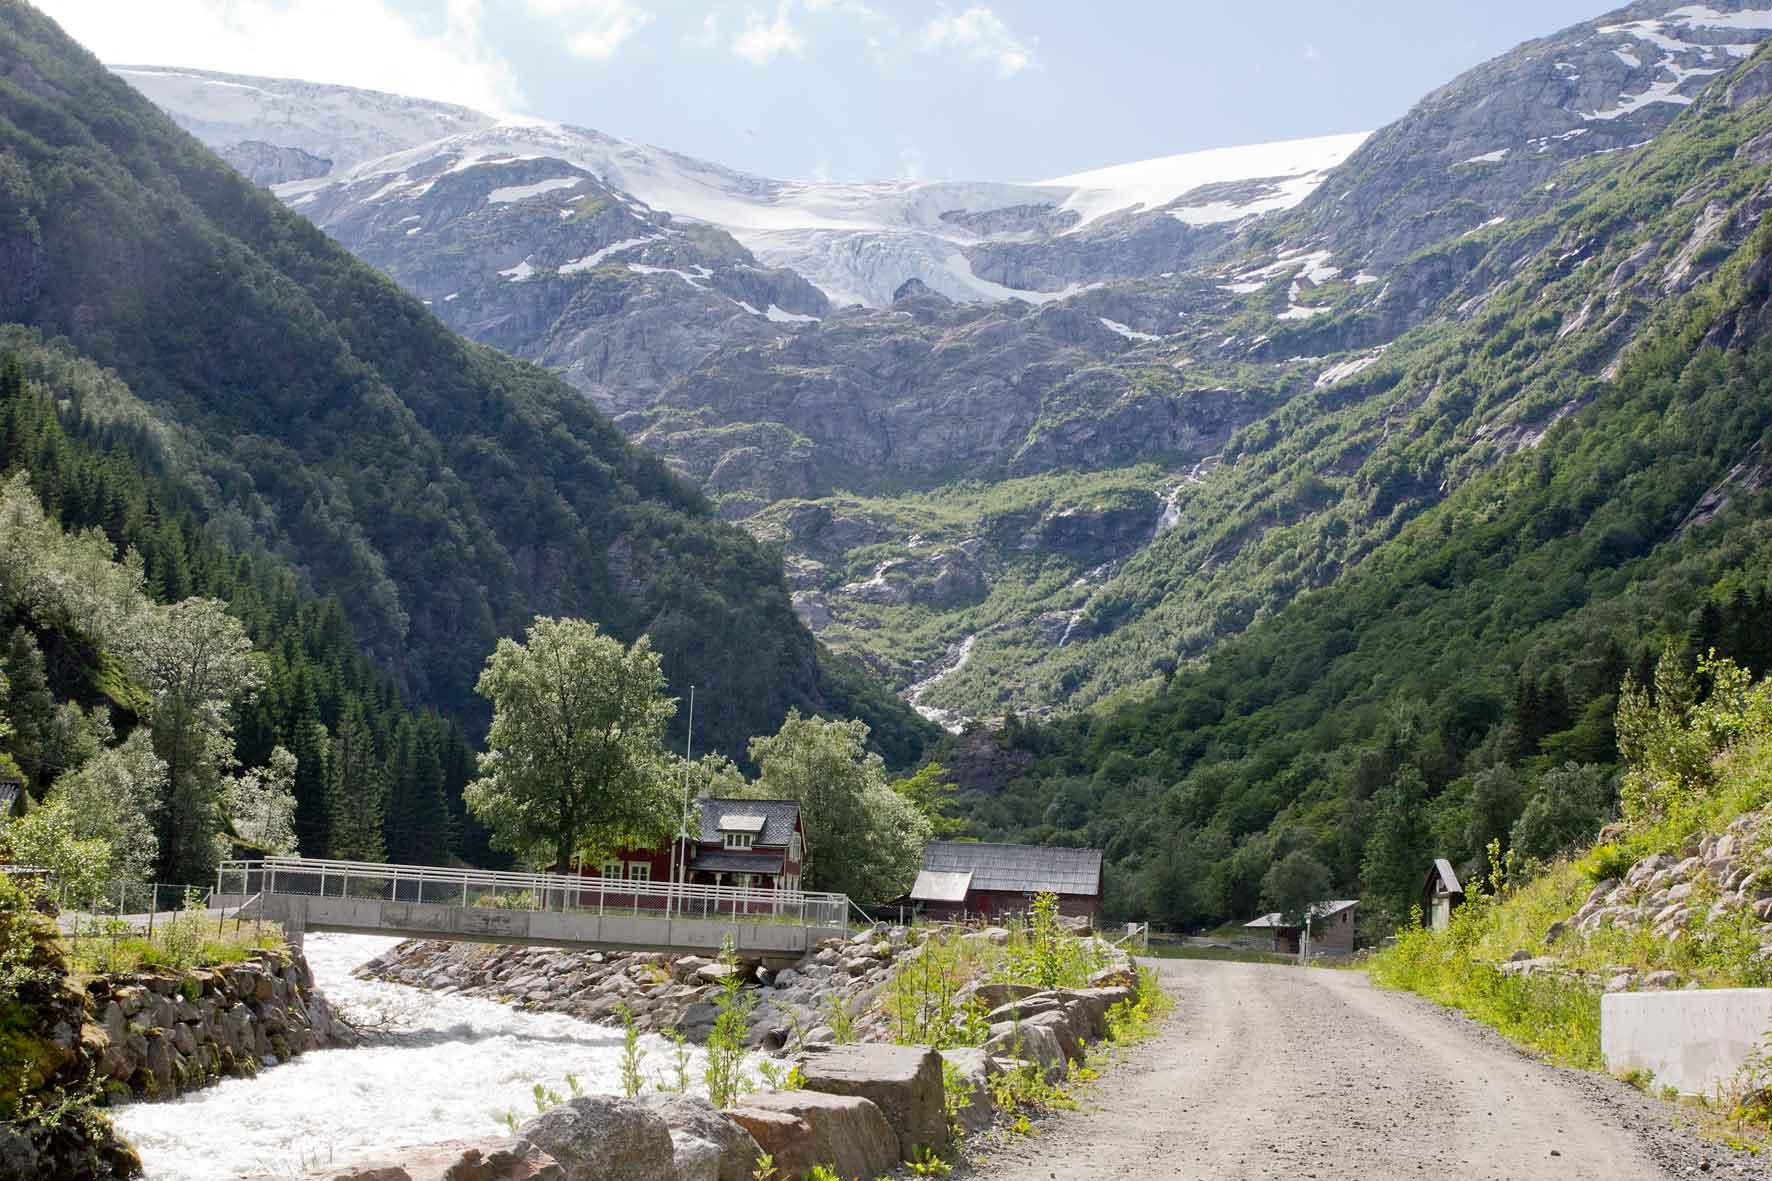 Der Aufstieg zum Gletscher Buarbreen kann beginnen. Folgefonna, Gletscher bei Odda, Norwegen